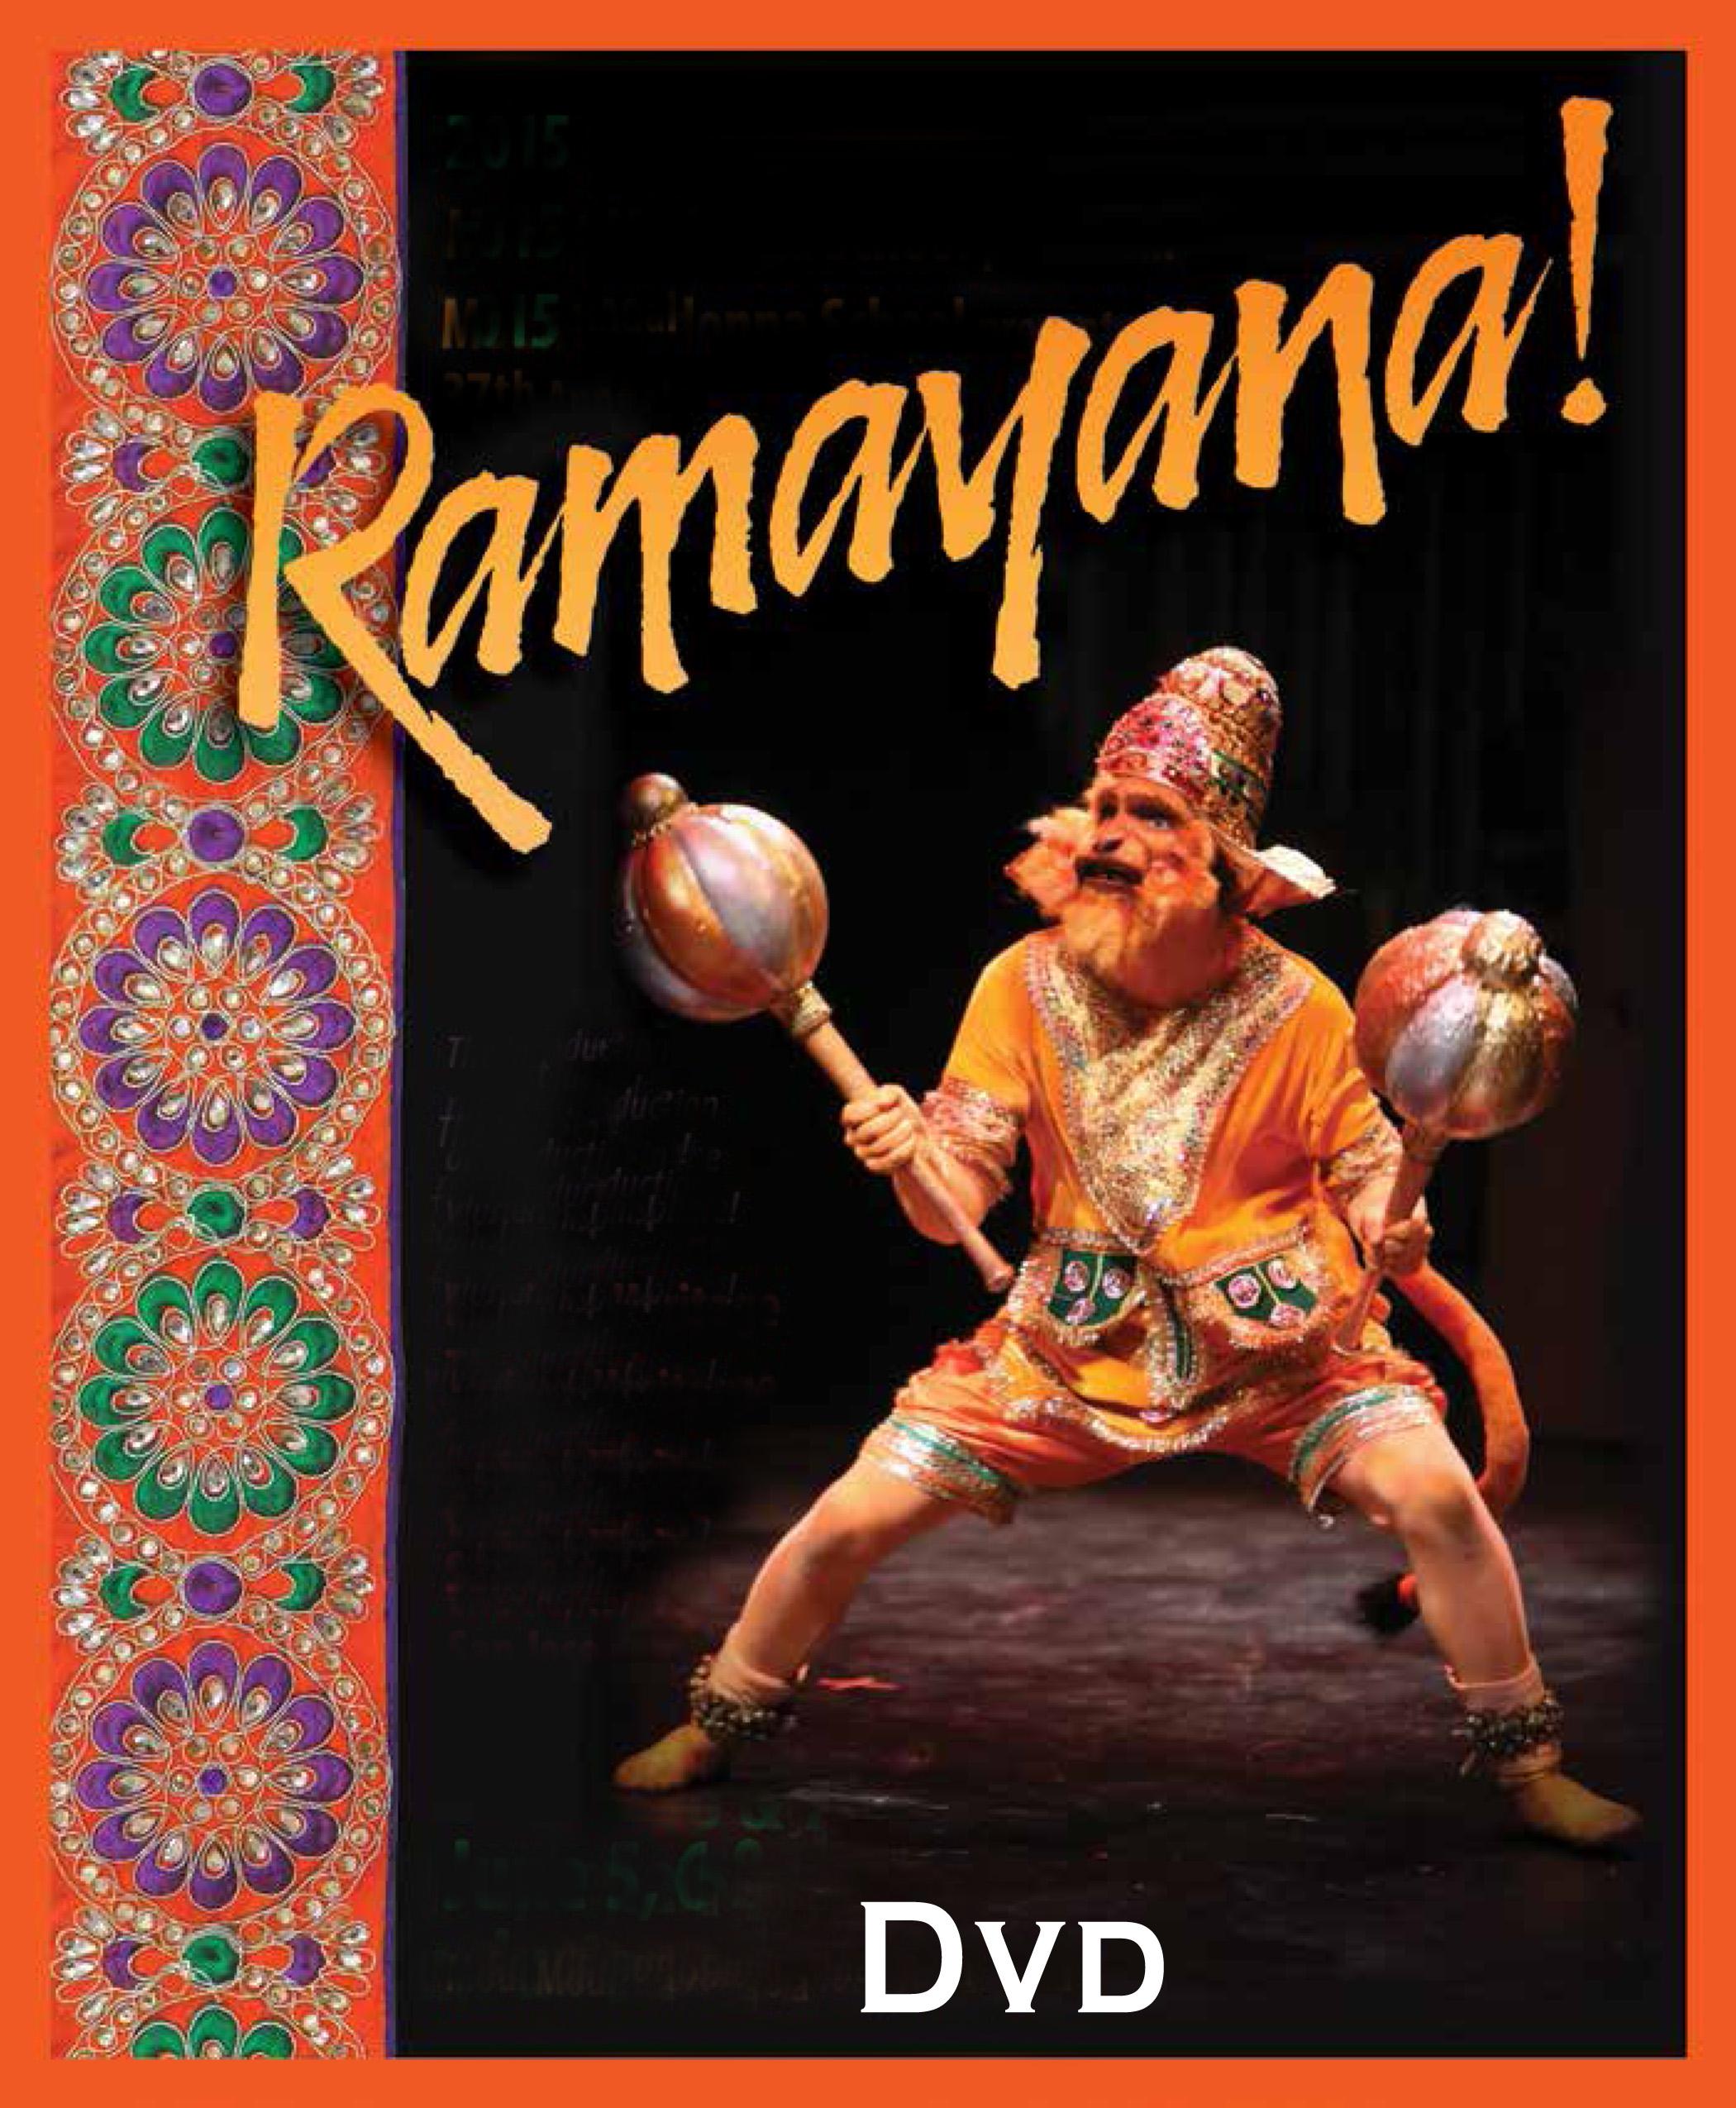 2015 <i>Ramayana!</i> DVD